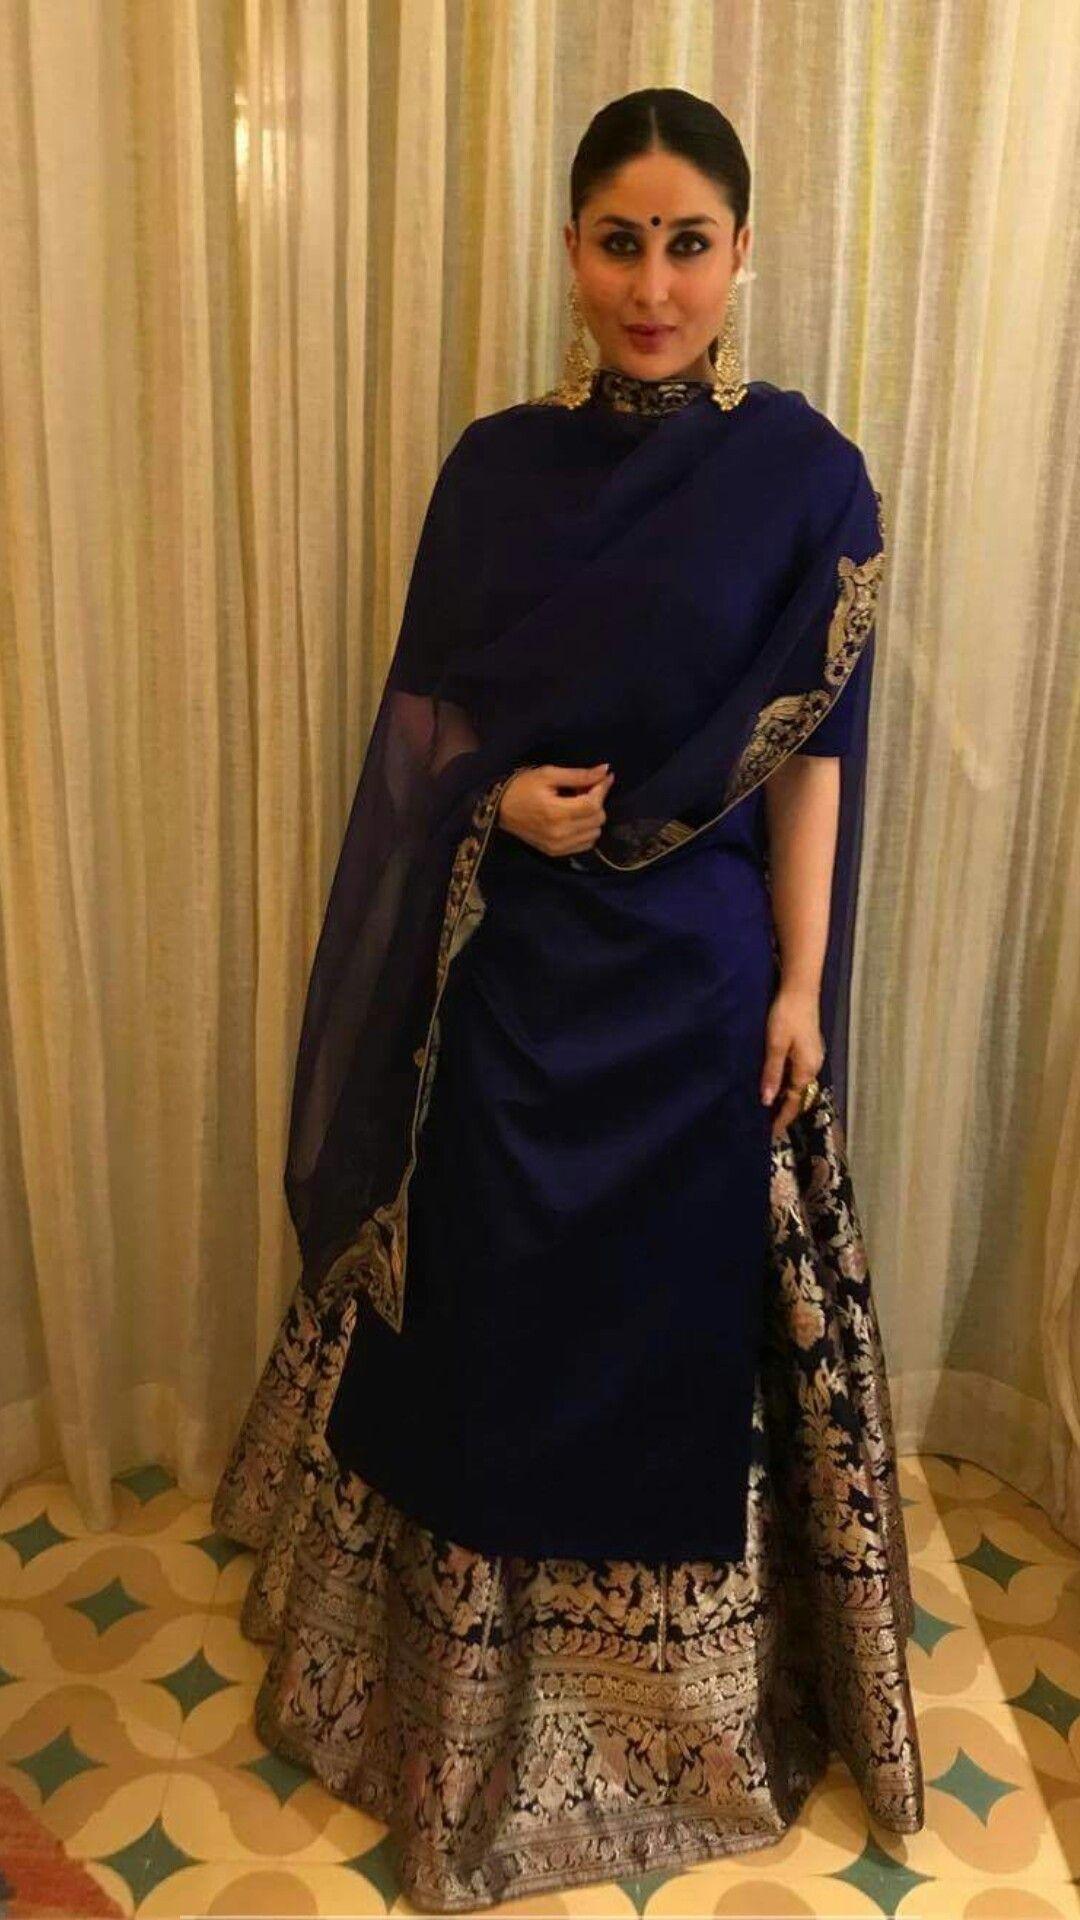 Kareena kapoor khan in royal blue and gold ensemble most probably